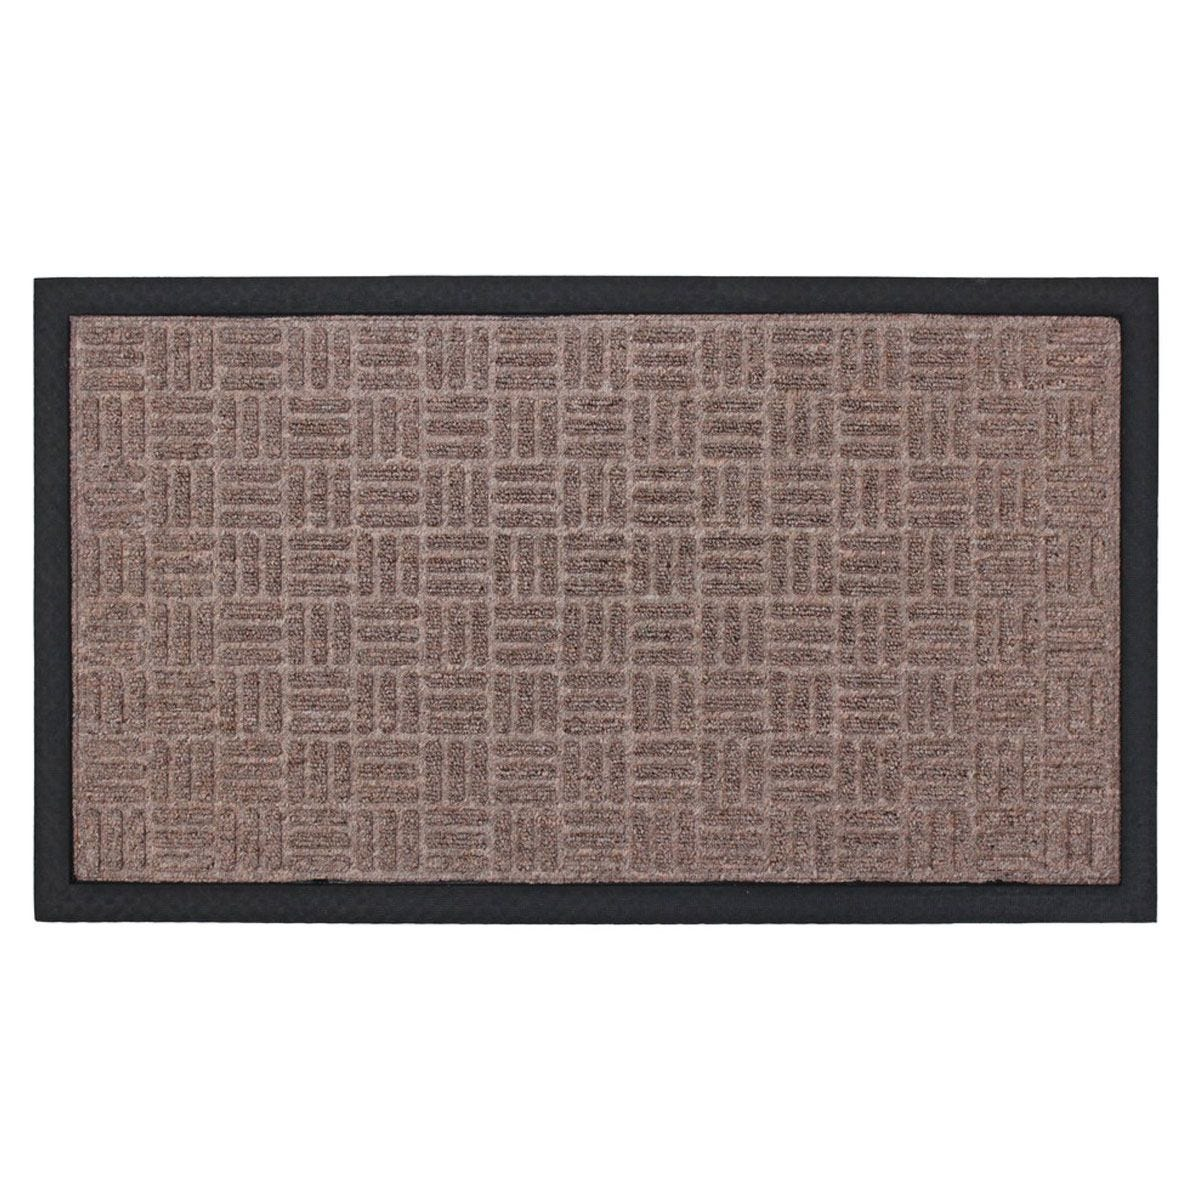 JVL Firth Carpet Rubber Backed Entrance 40 x 70cm Door Mat - Beige